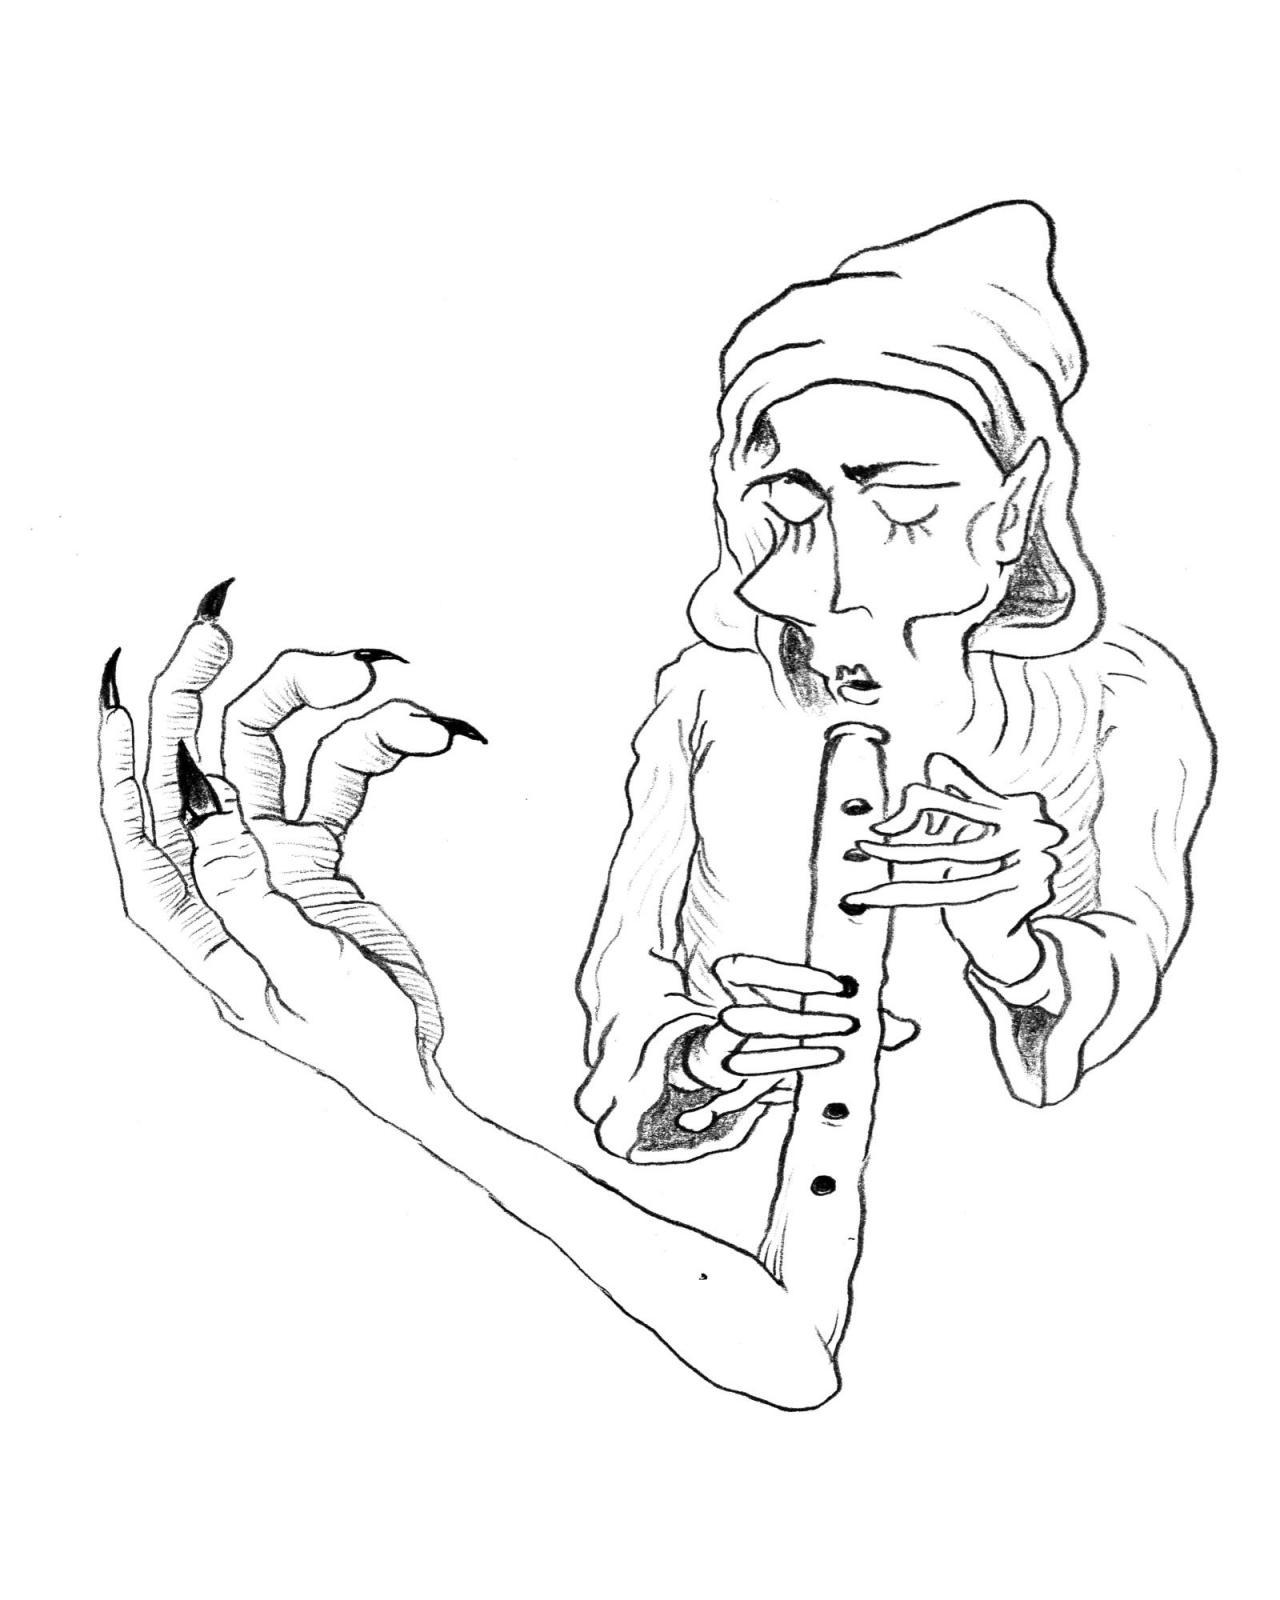 Seth Price, Arm Flute ,Graphite on paper, 18.5 x 25 cm